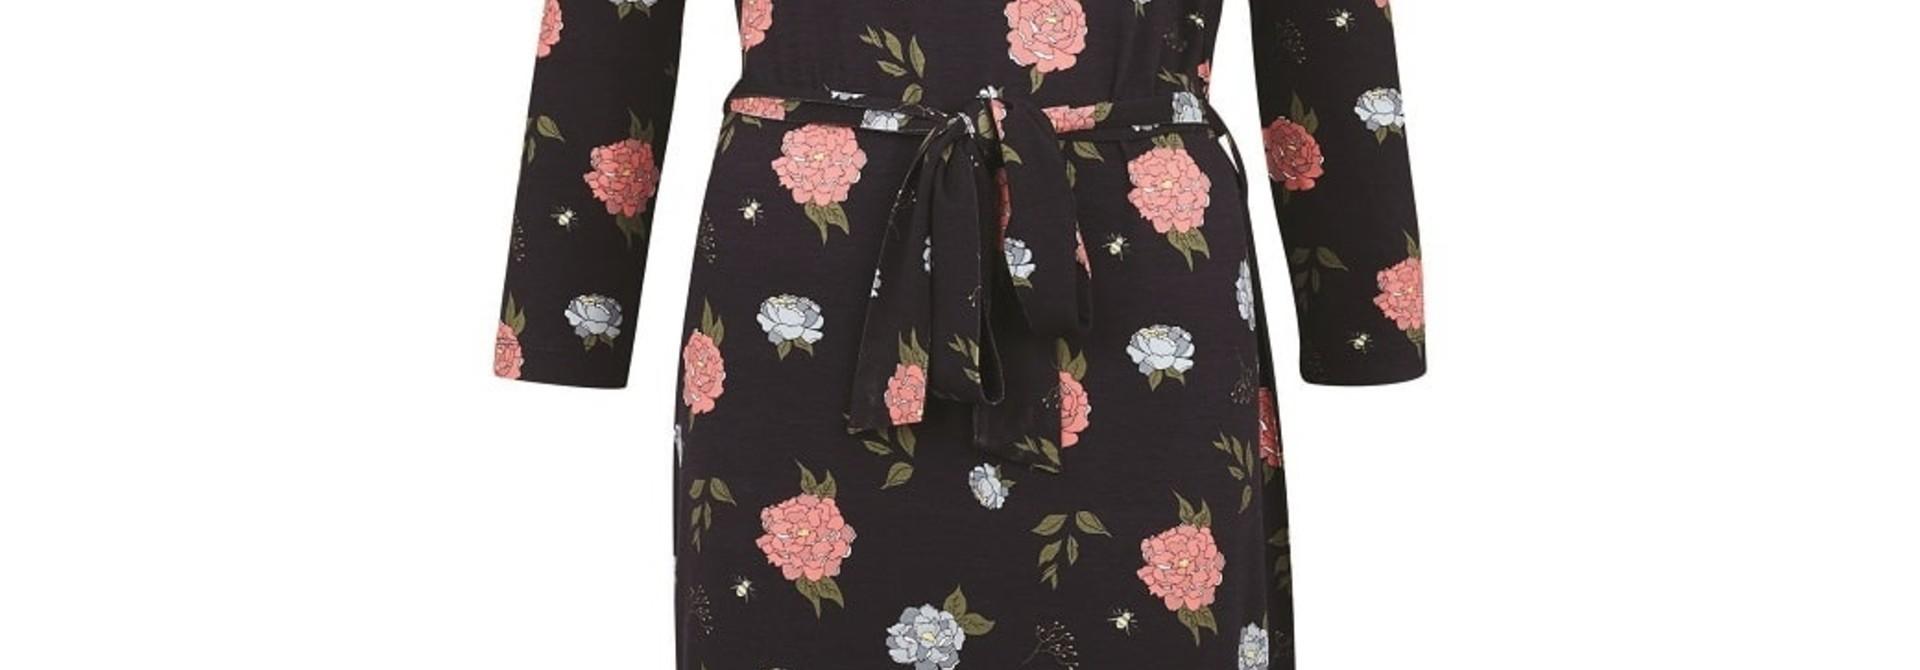 Barbour Newbury Dress Multi